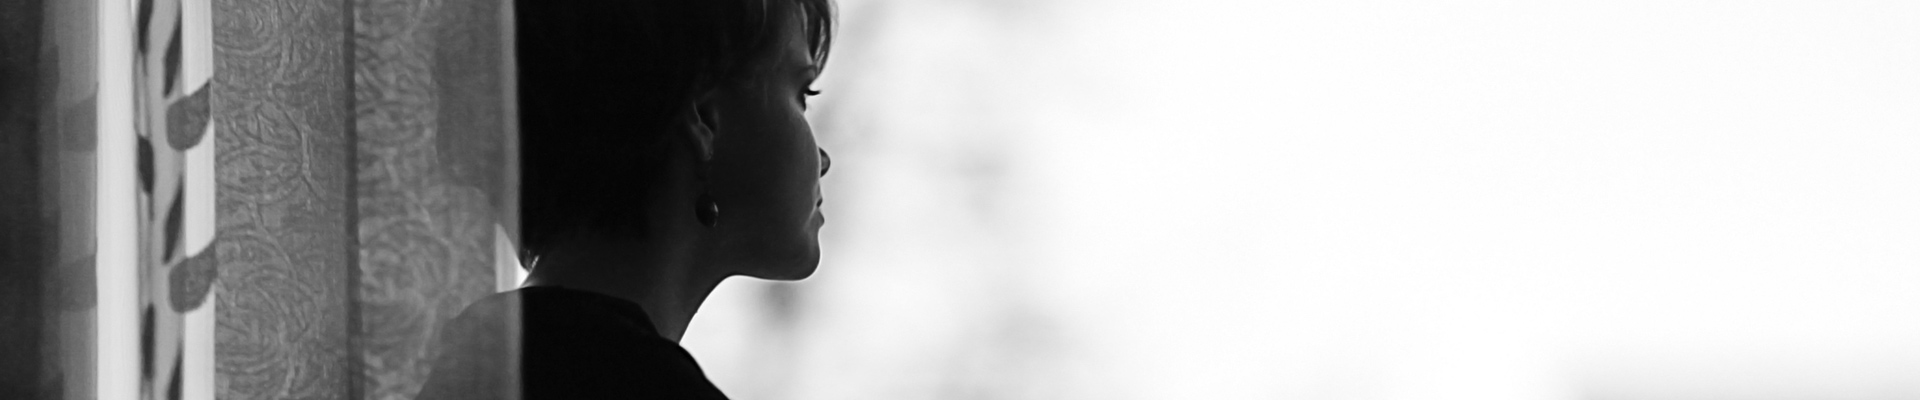 Valdtakt chockade kvinna svart